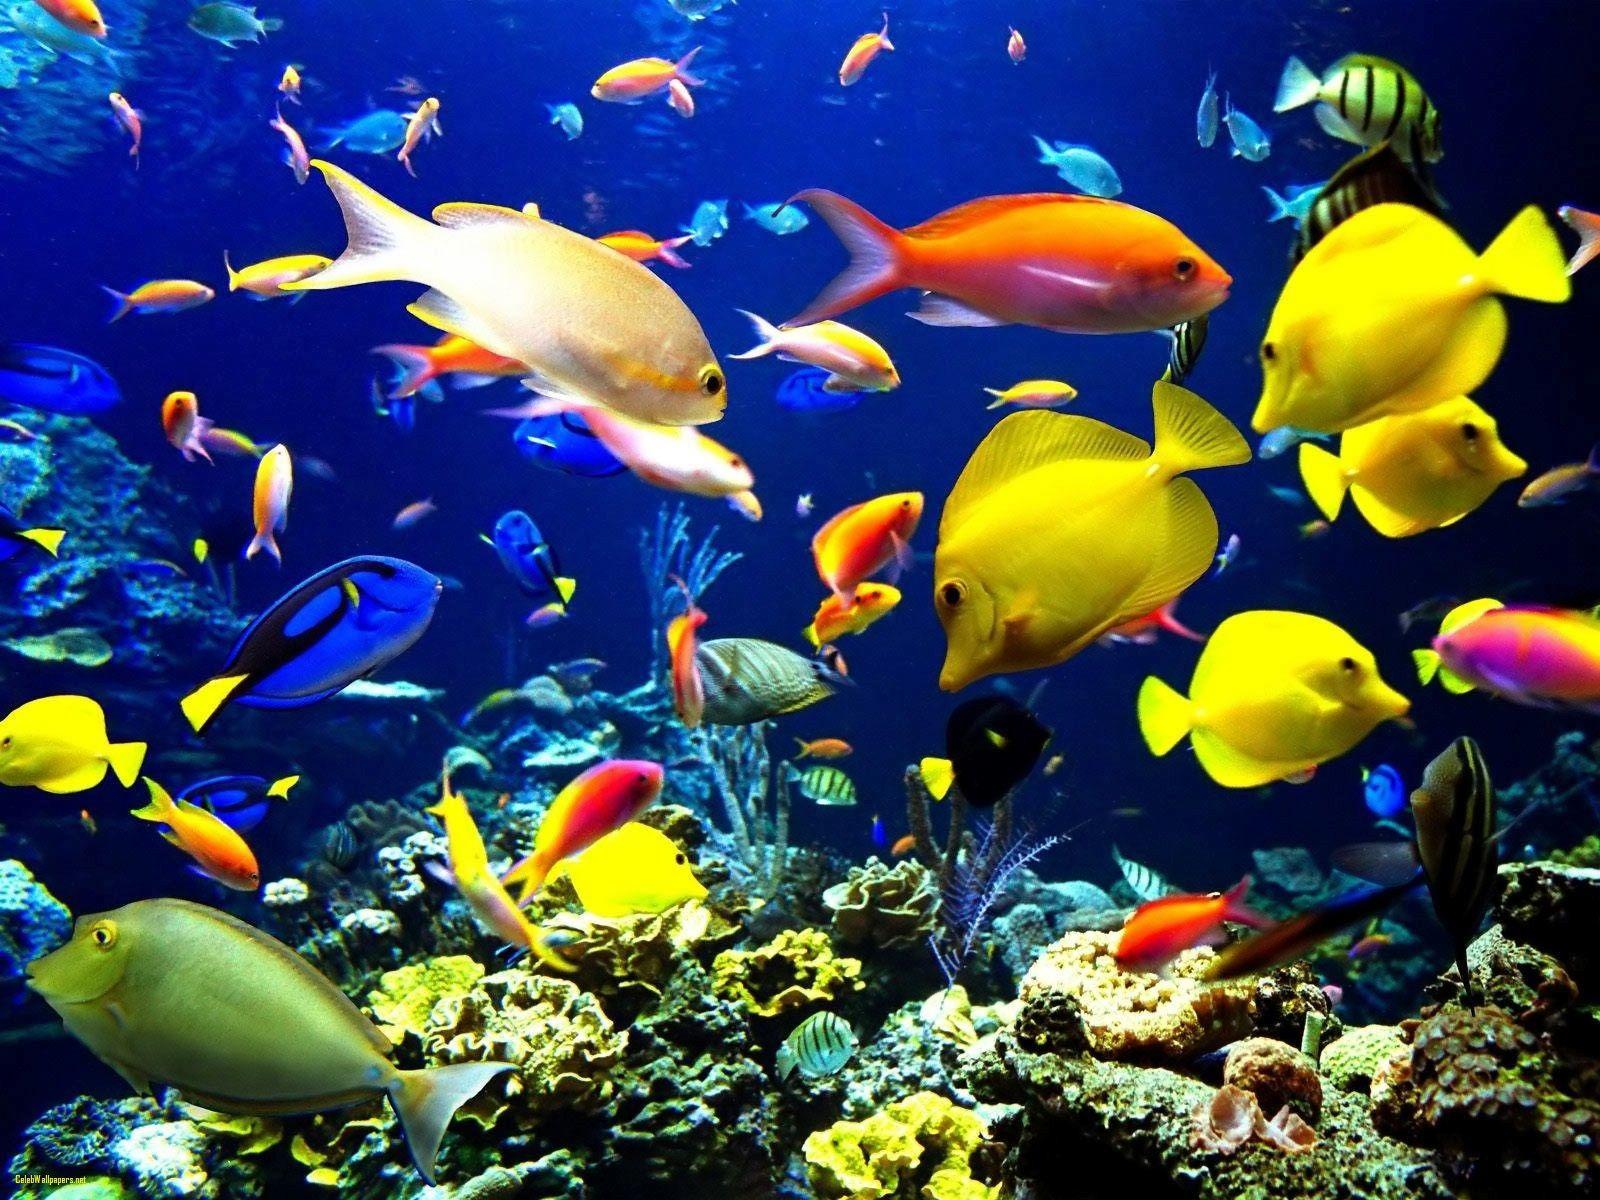 fish live wallpaper free  Live Wallpapers Free Fresh Fish Full Hd Quality Desktop Live Fish ...